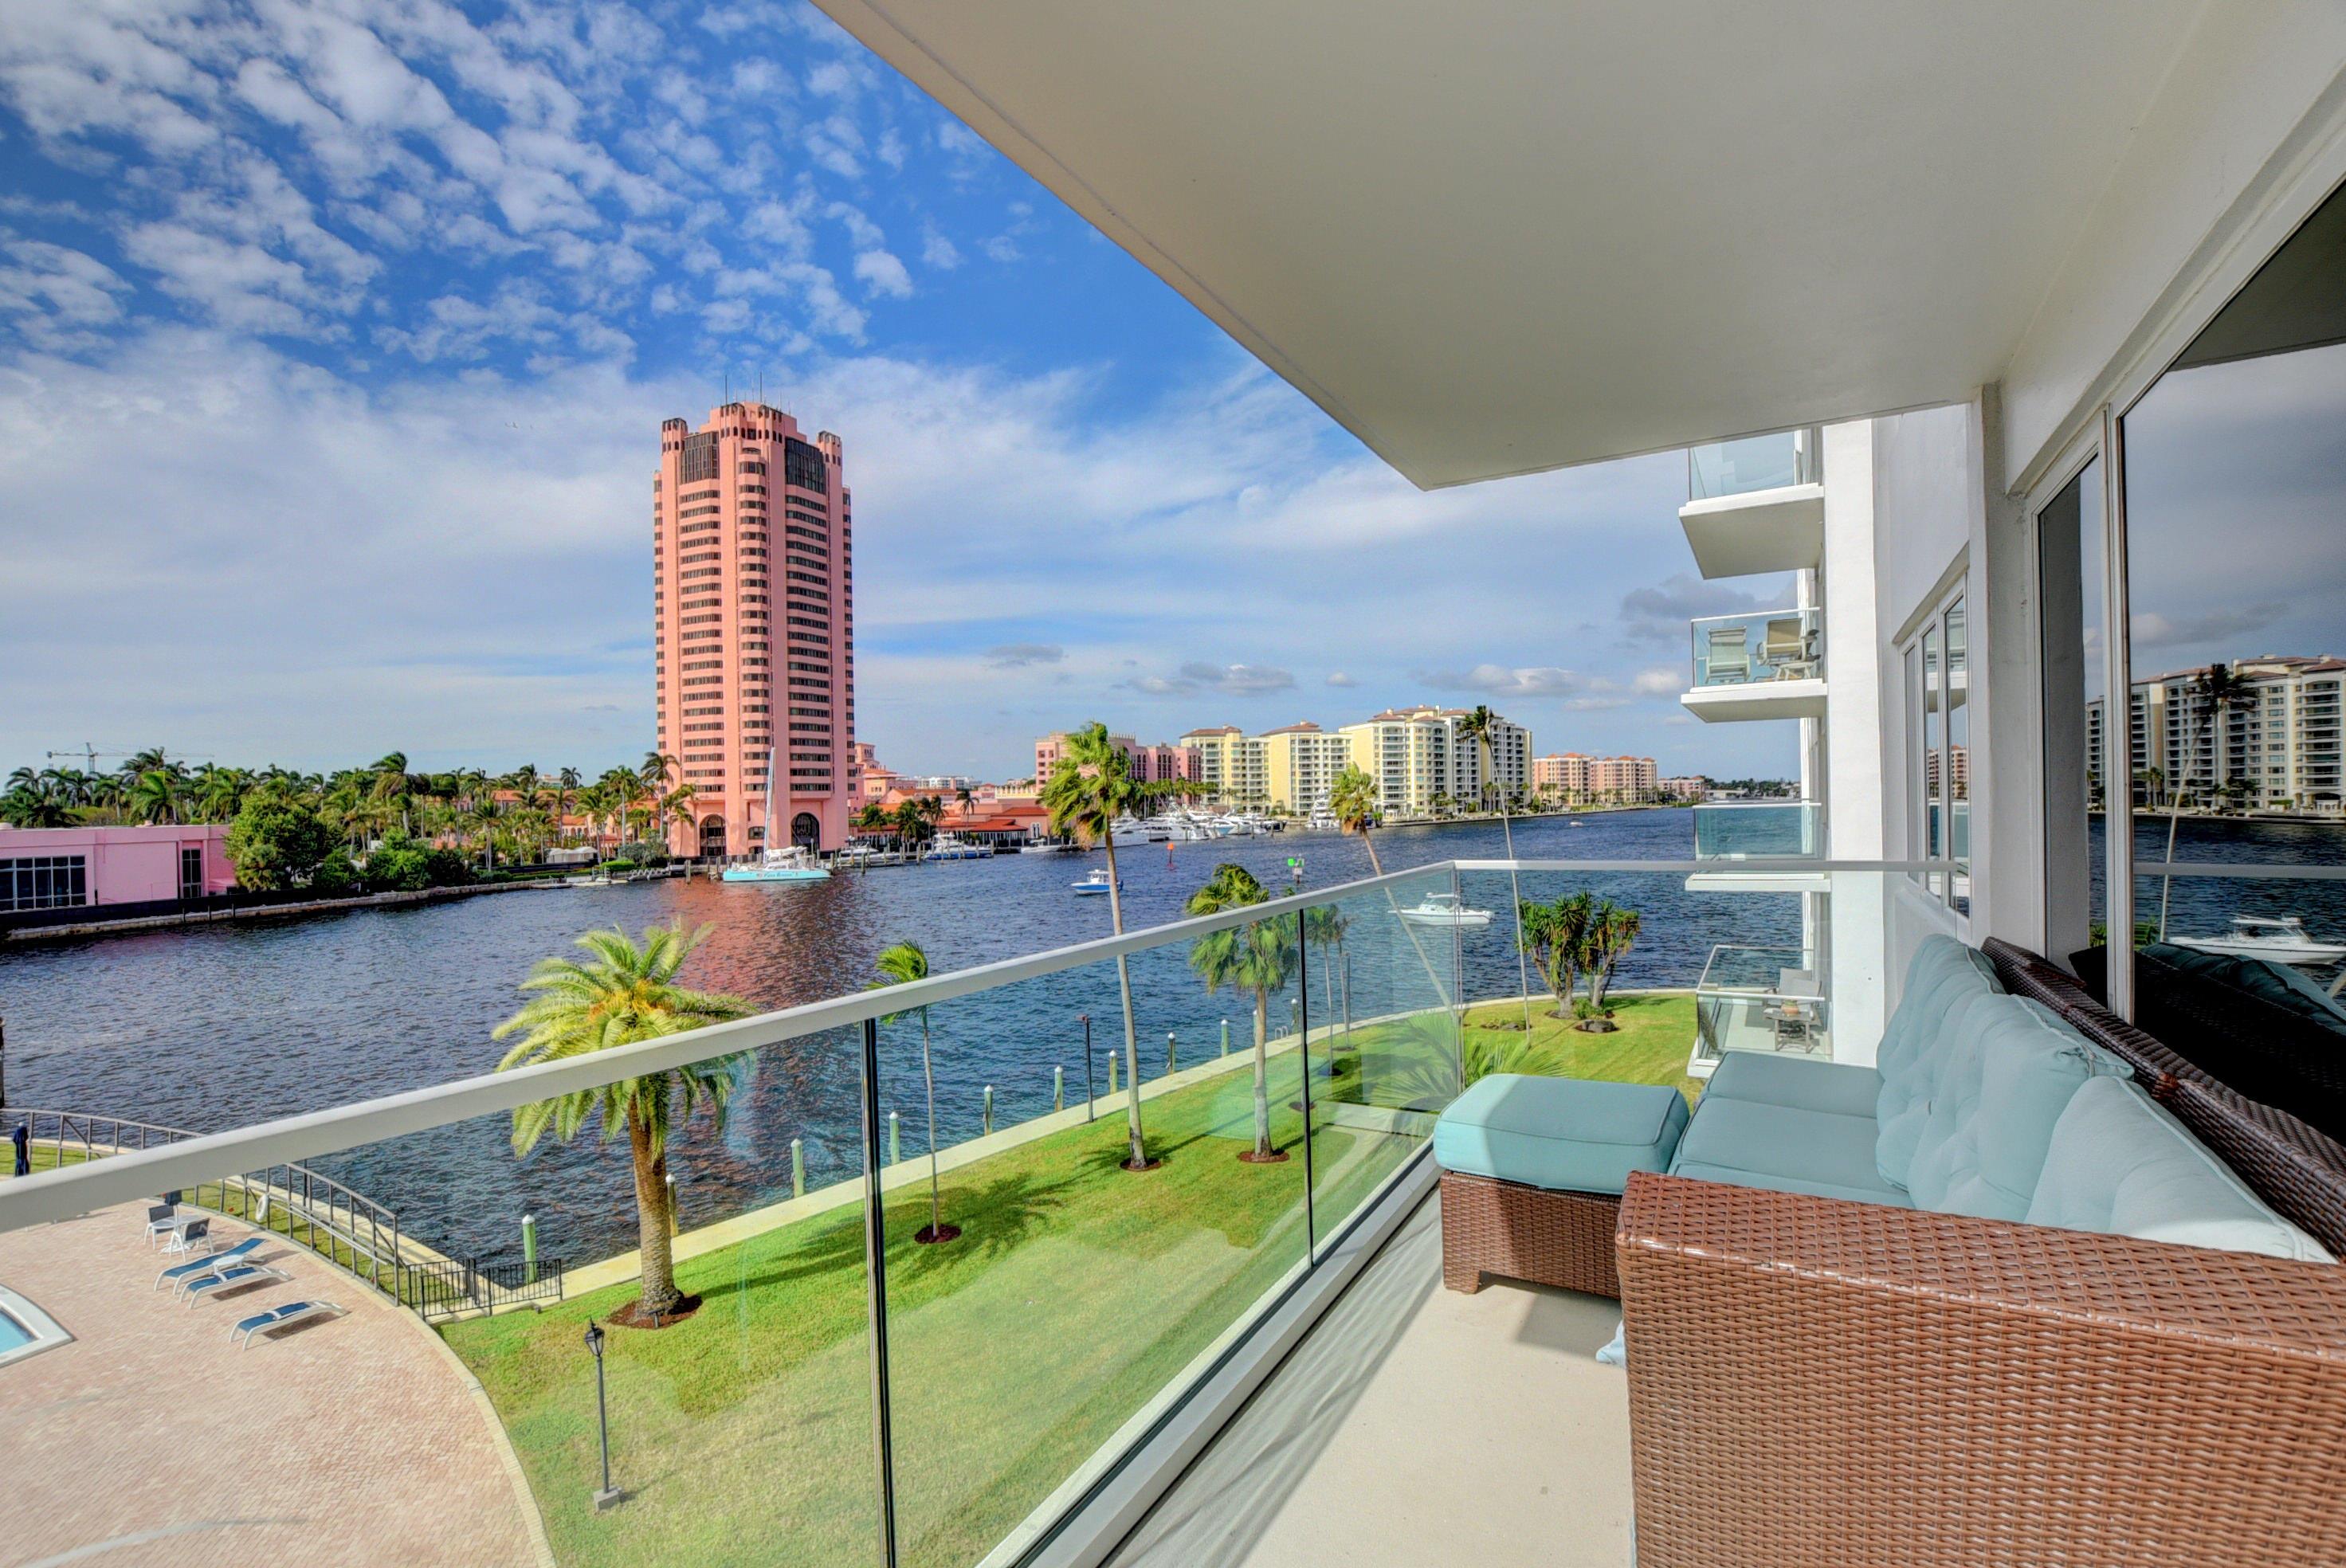 Photo of 701 E Camino Real #4g, Boca Raton, FL 33432